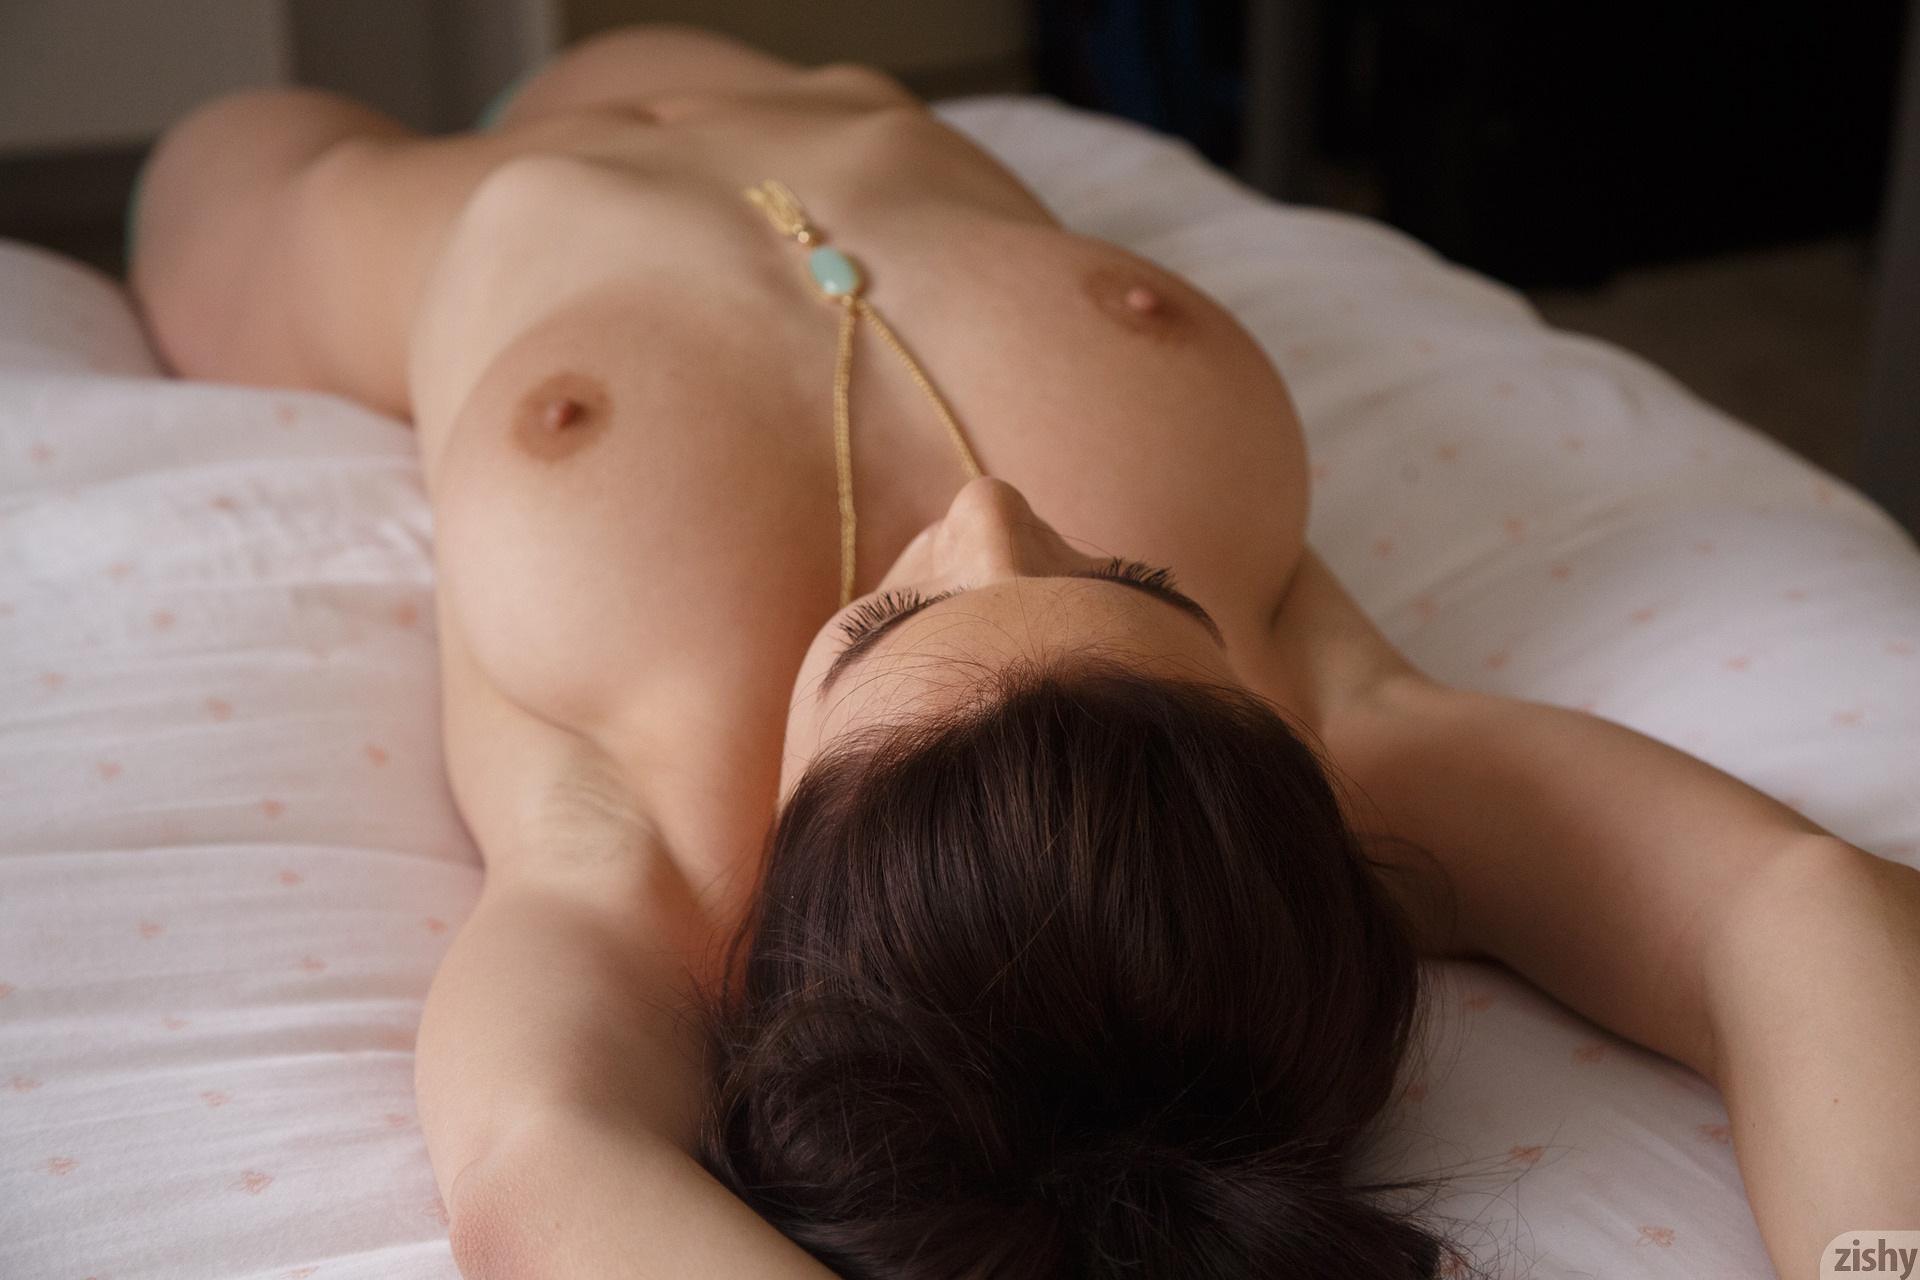 Lana nudes